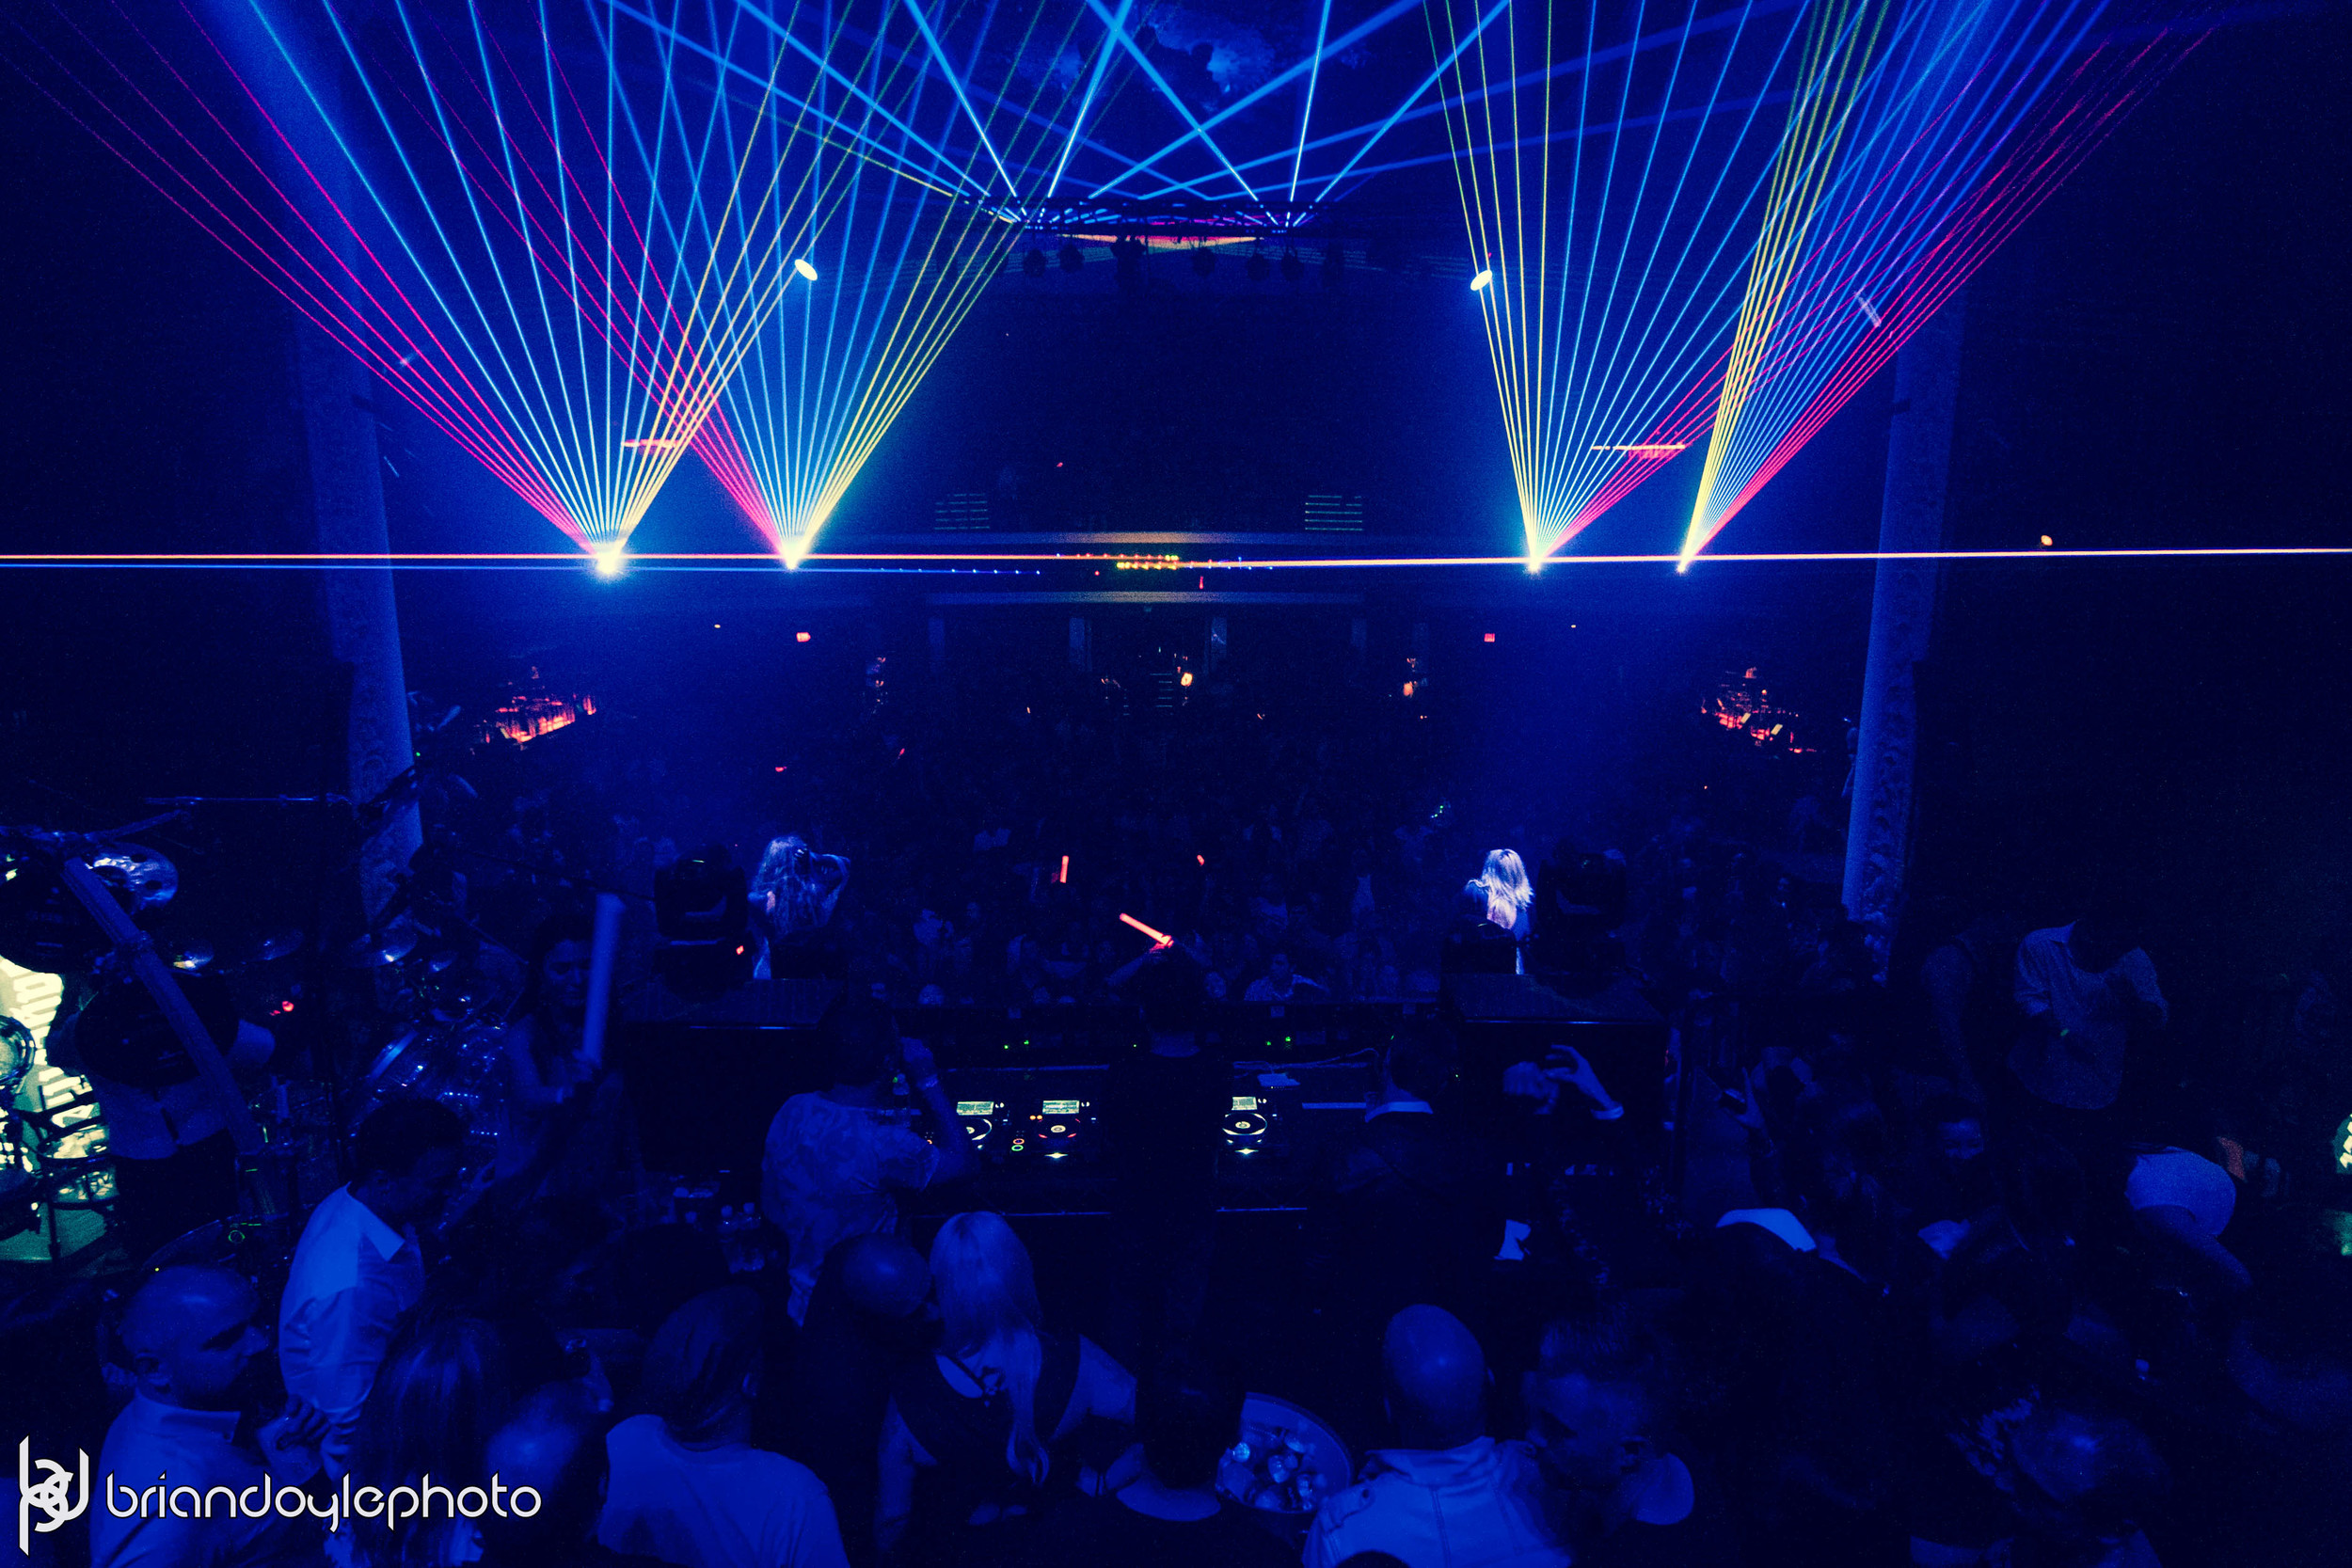 Jagermeister Presents - Paul Oakenfold @ Avalon bdp 27.09.14-51.jpg